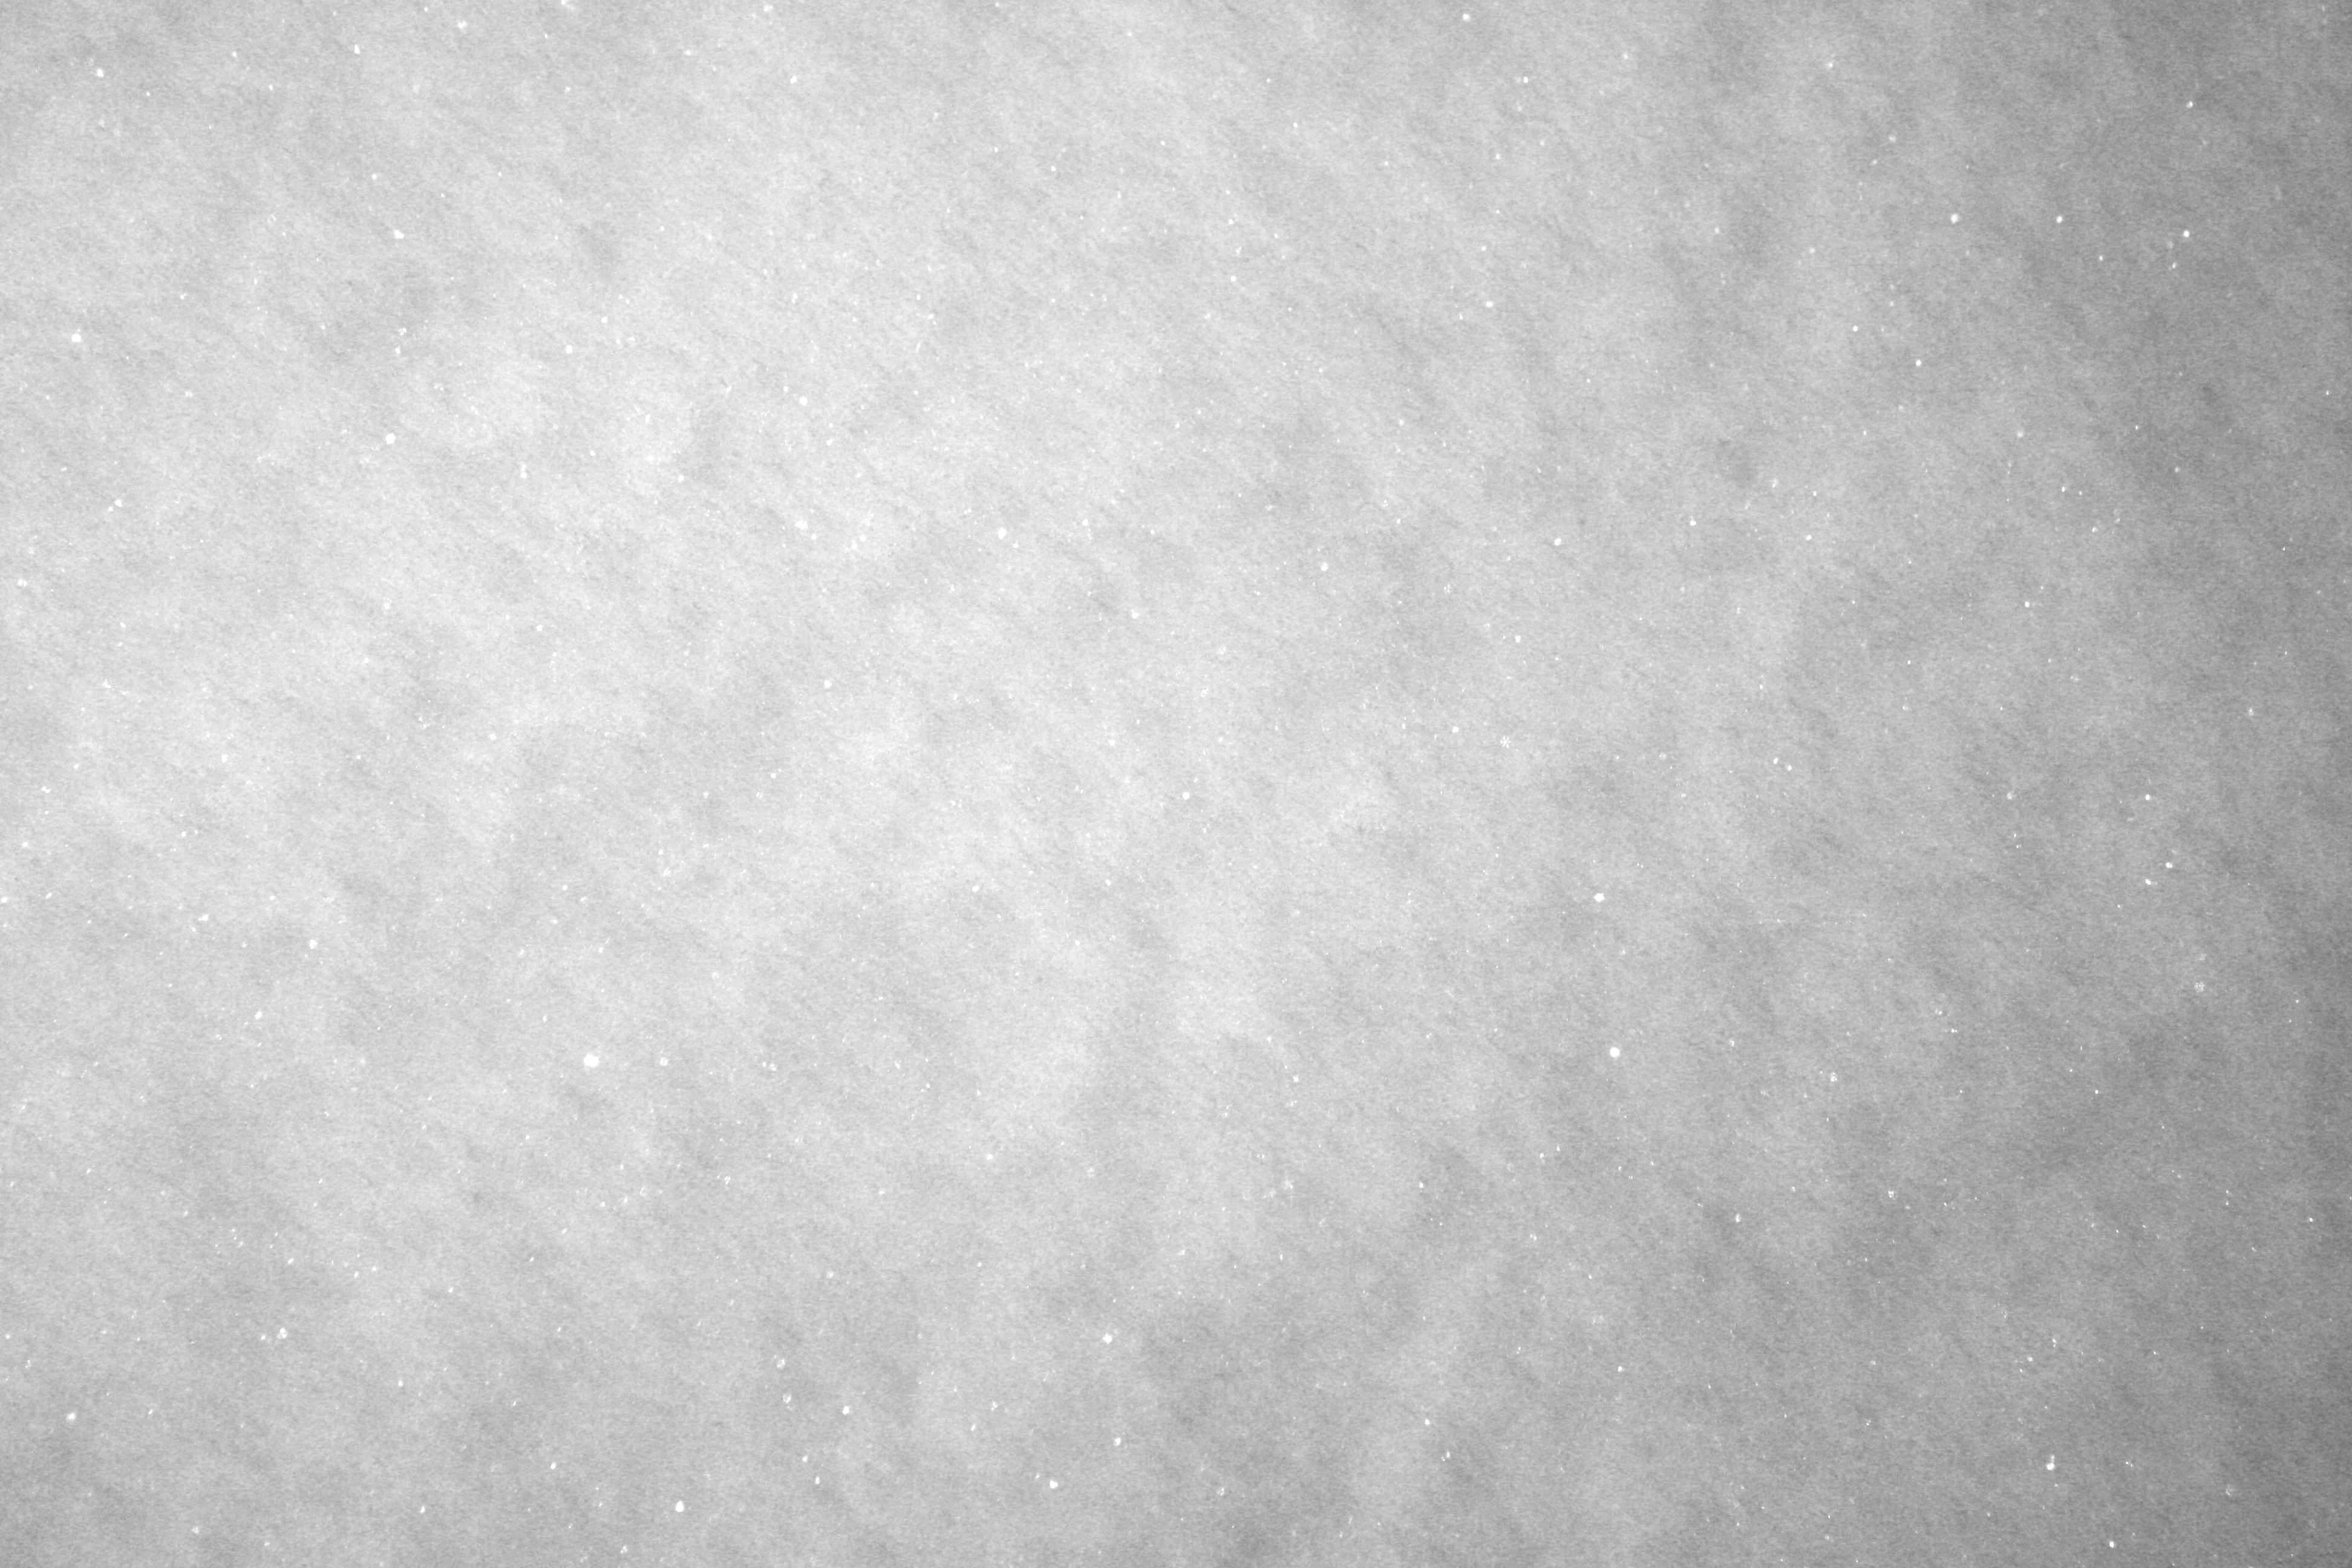 sparkling snow texture